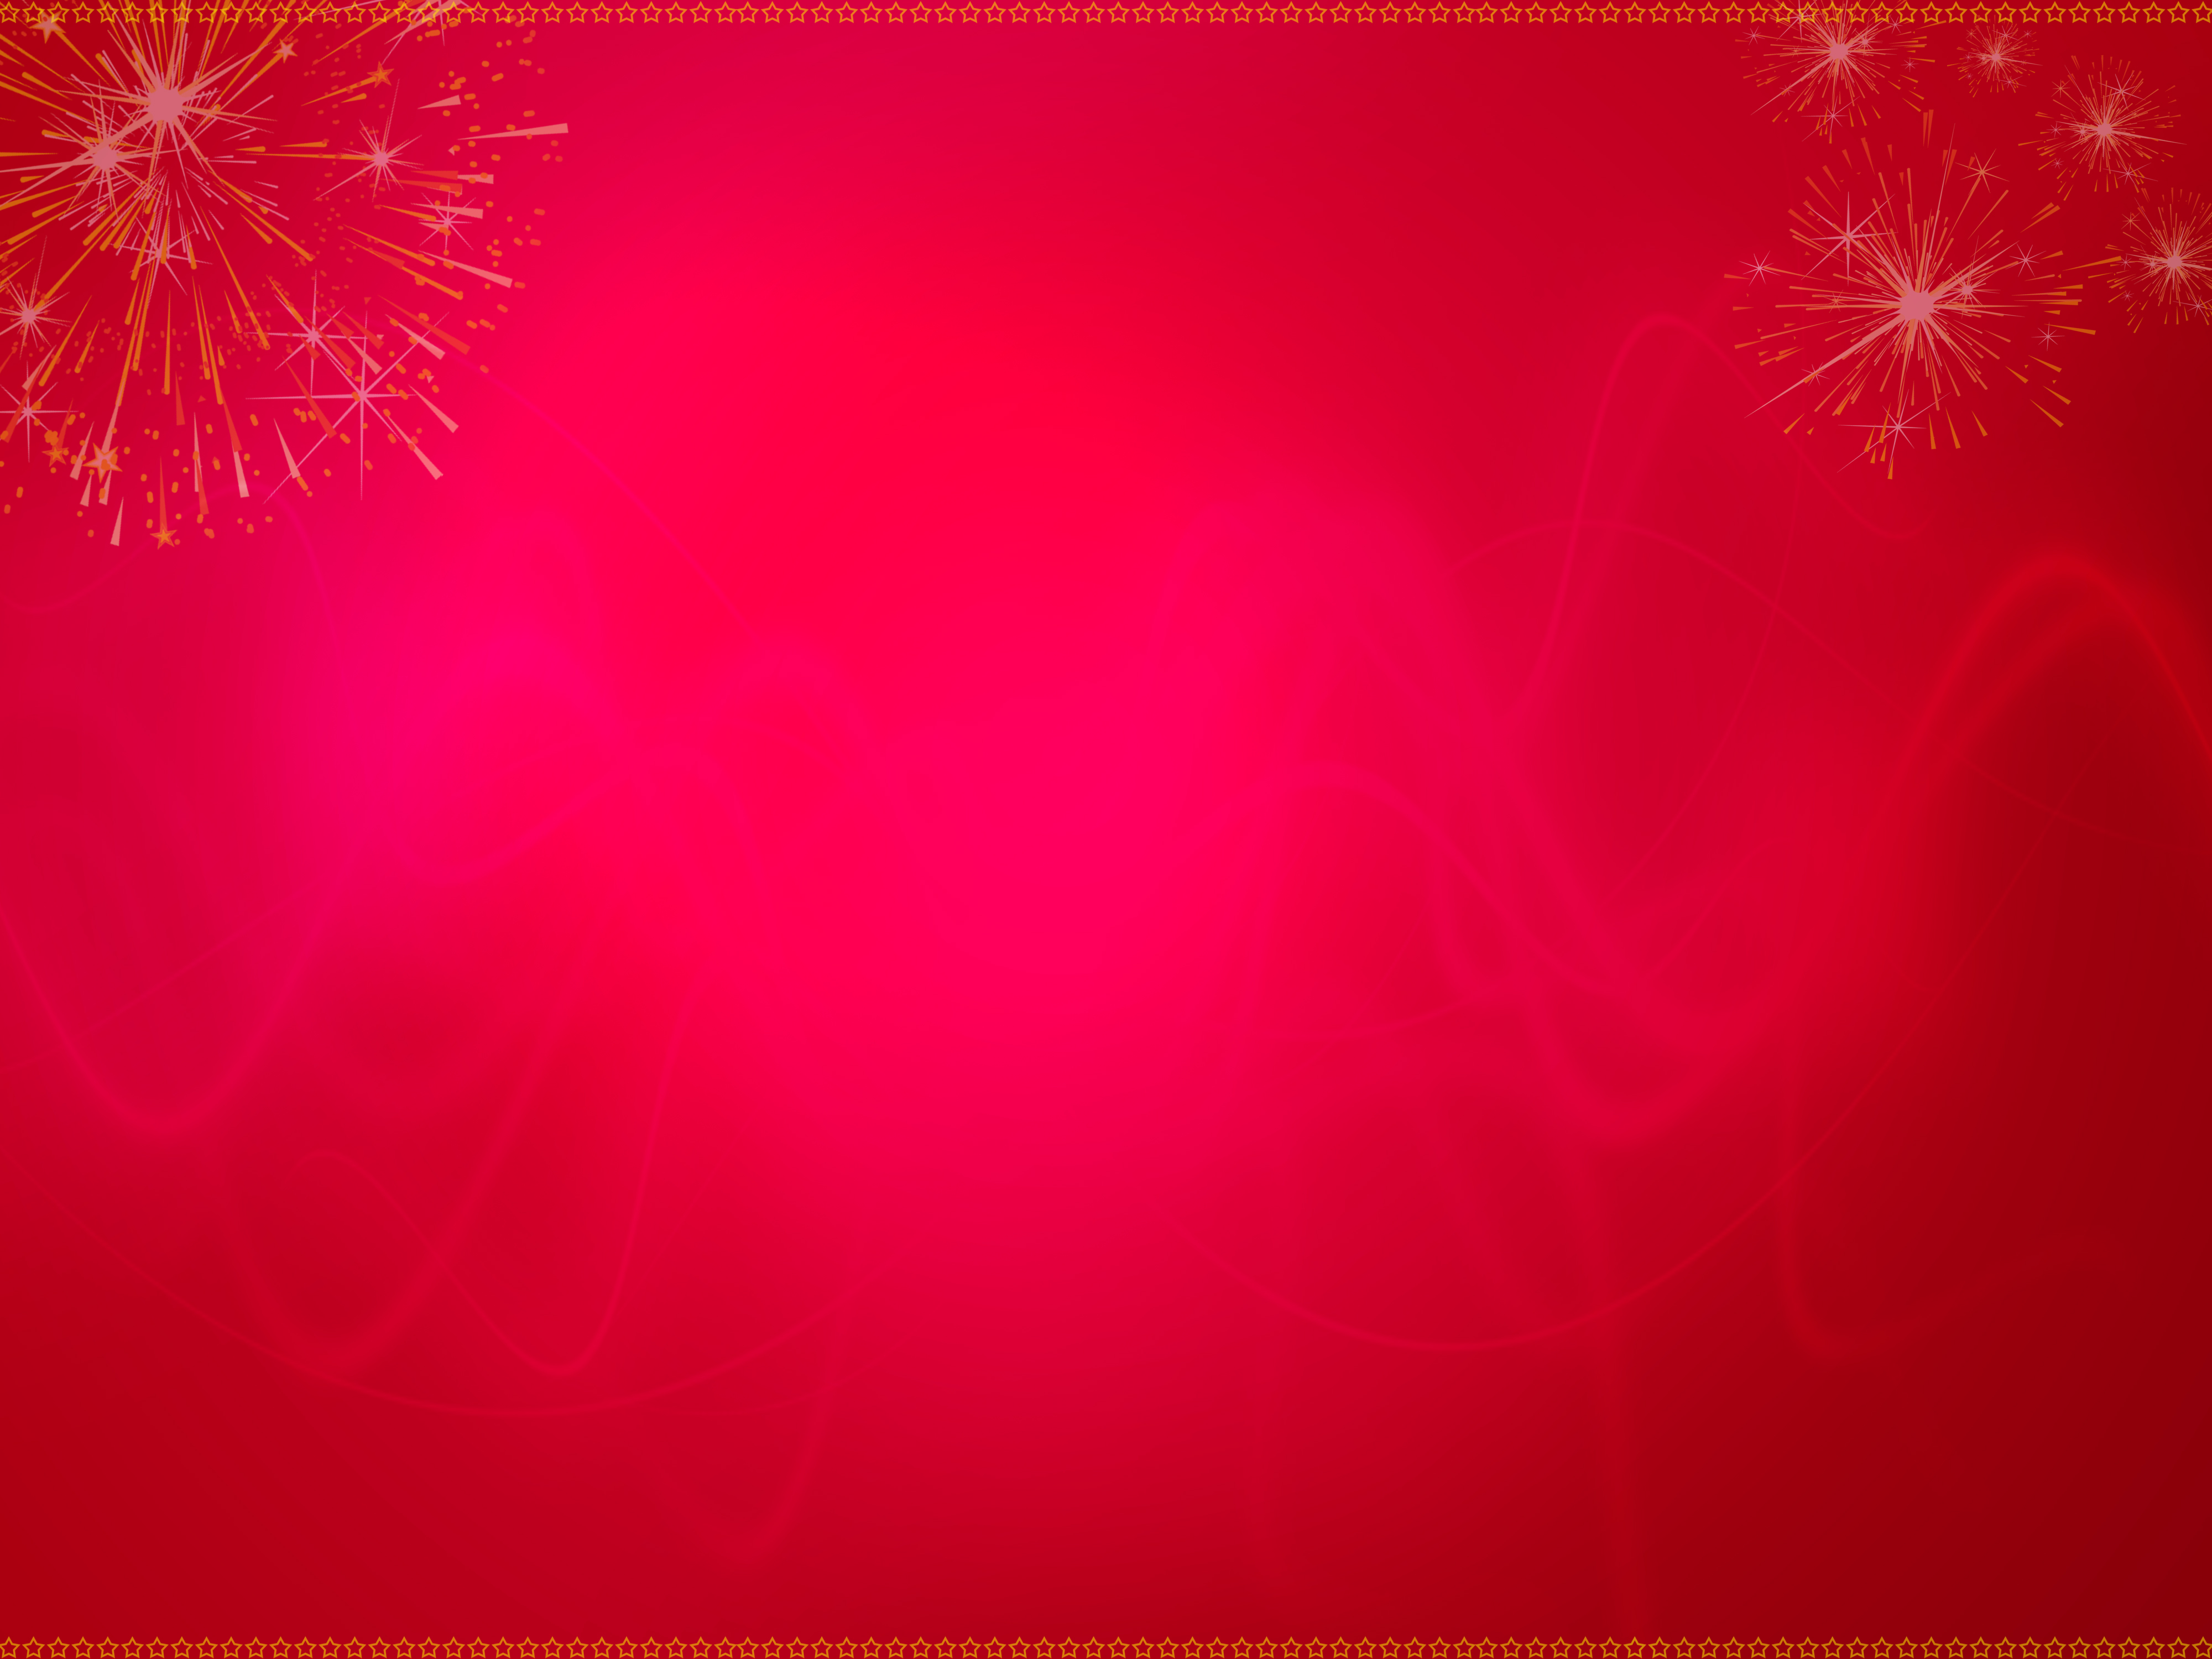 Red Festive Wedding Celebration Background, Red, Wedding ...